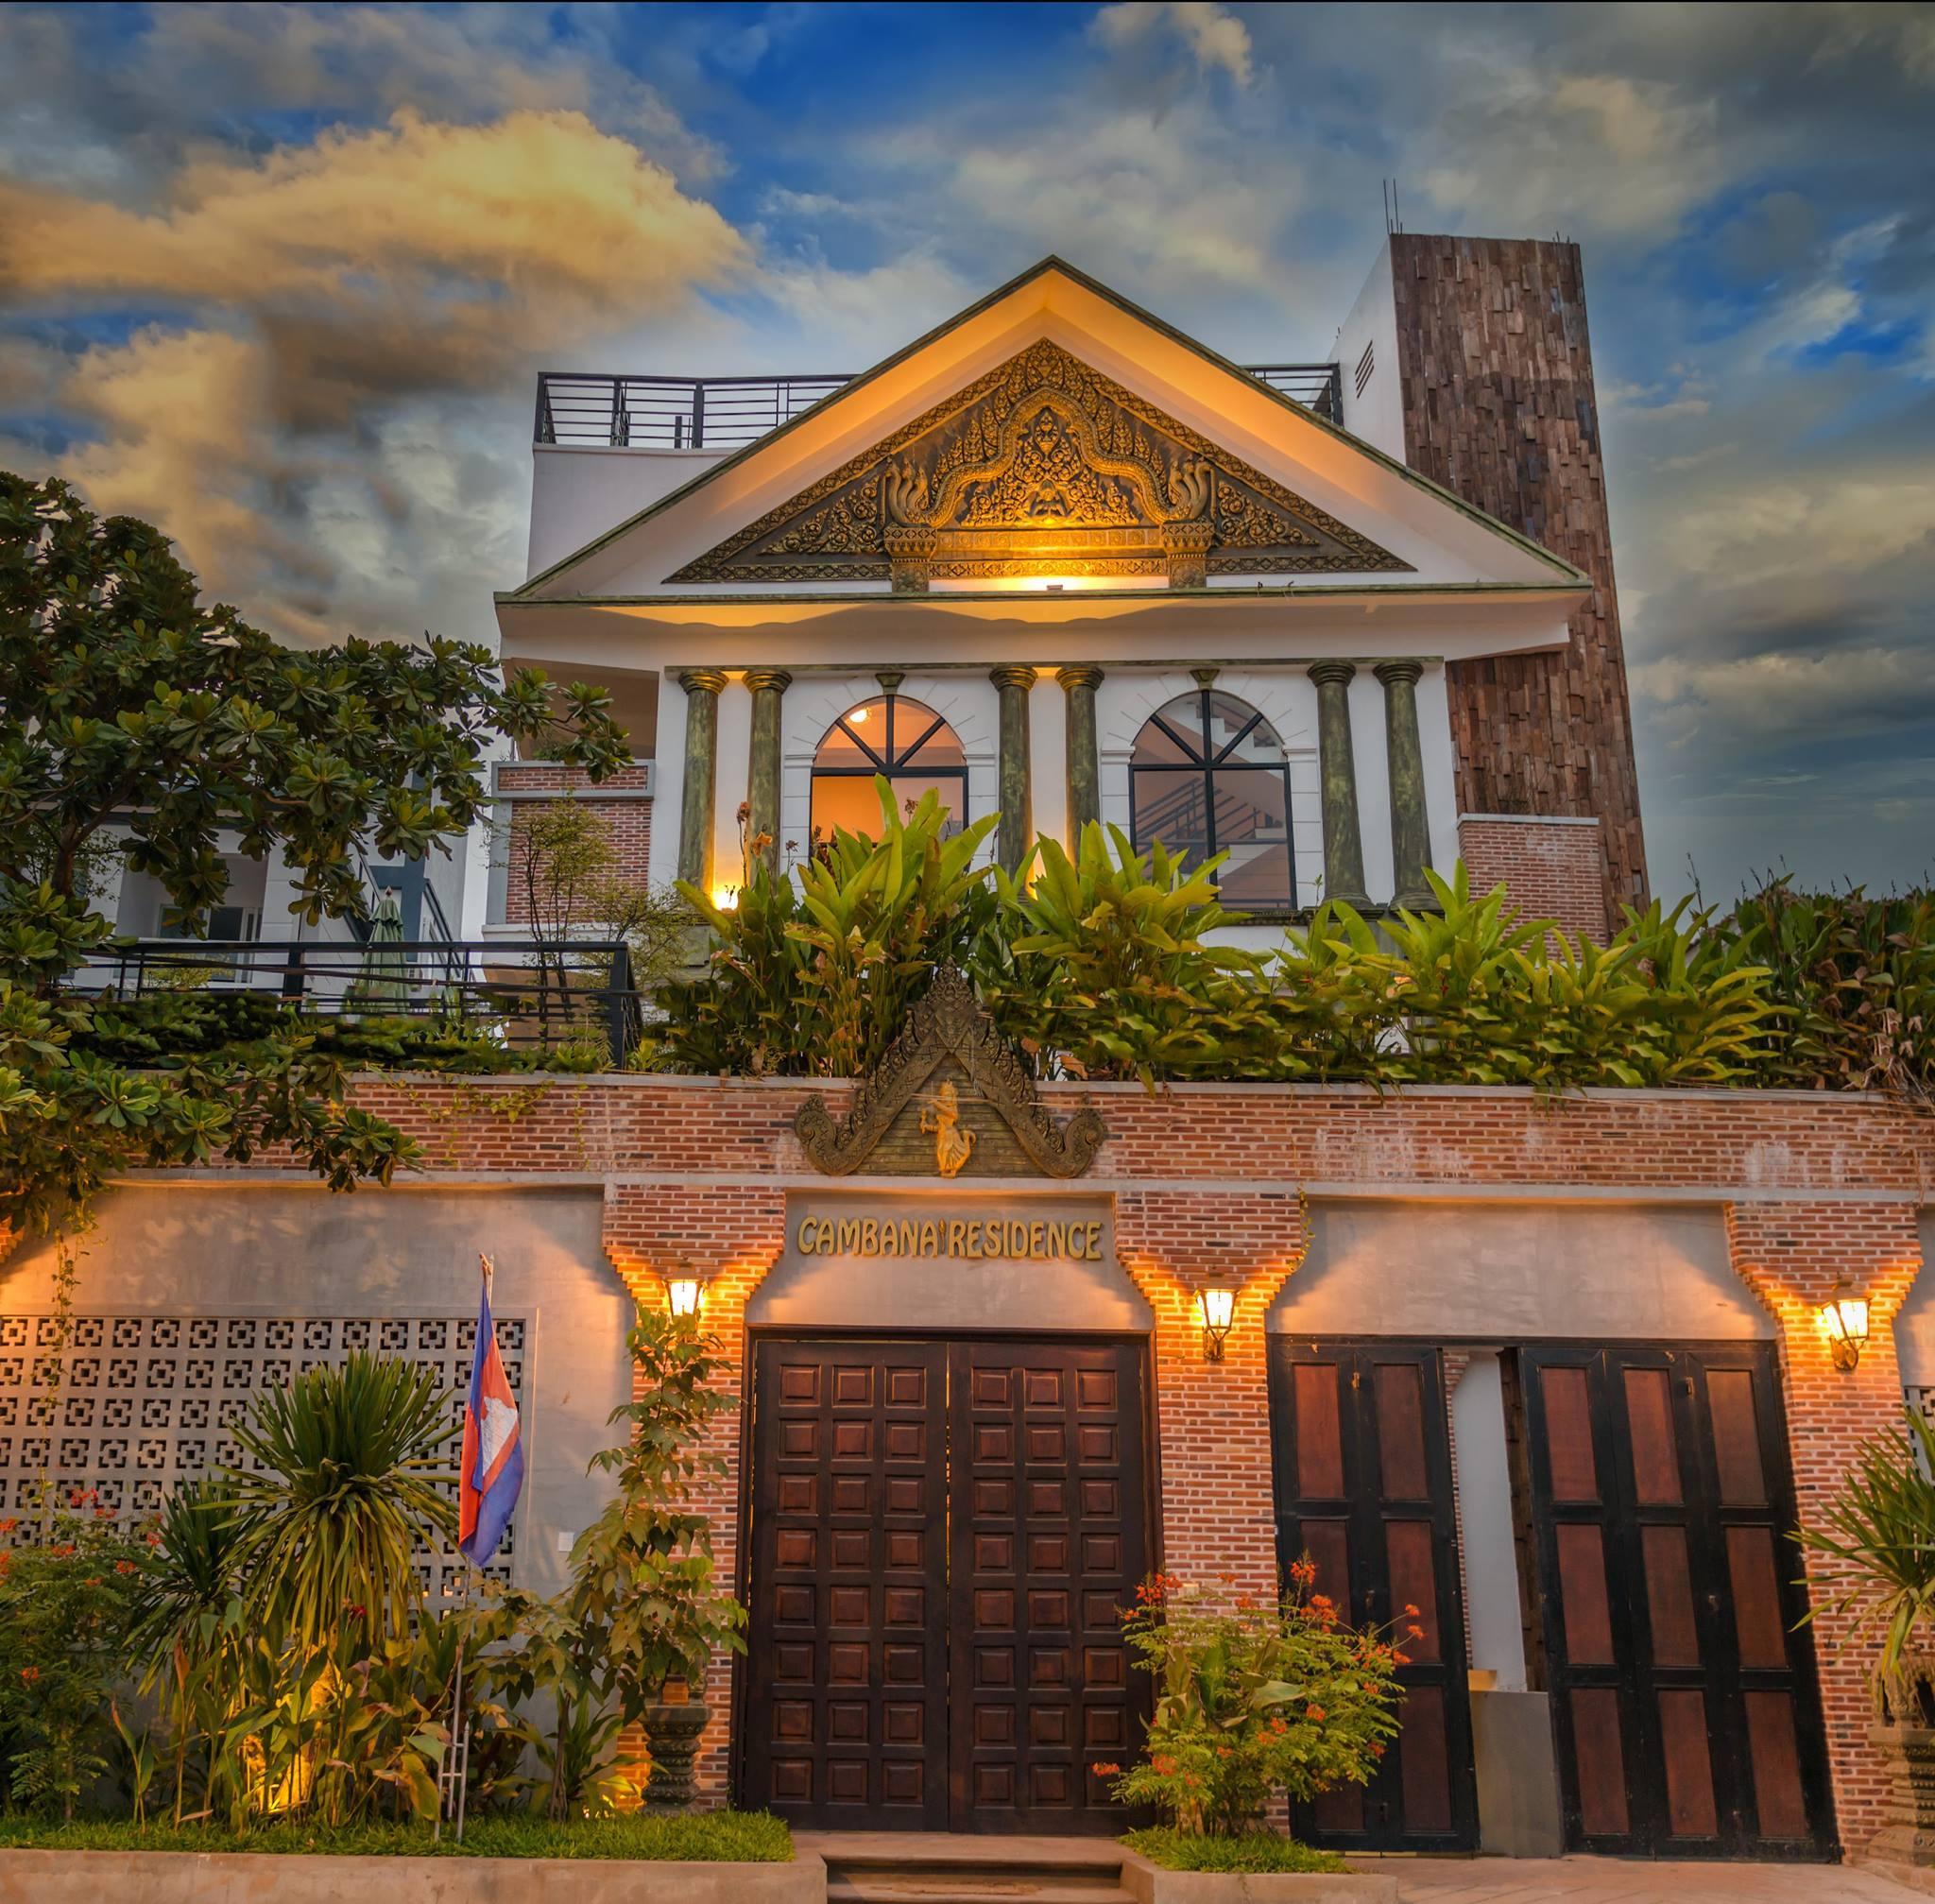 Cambana Residence